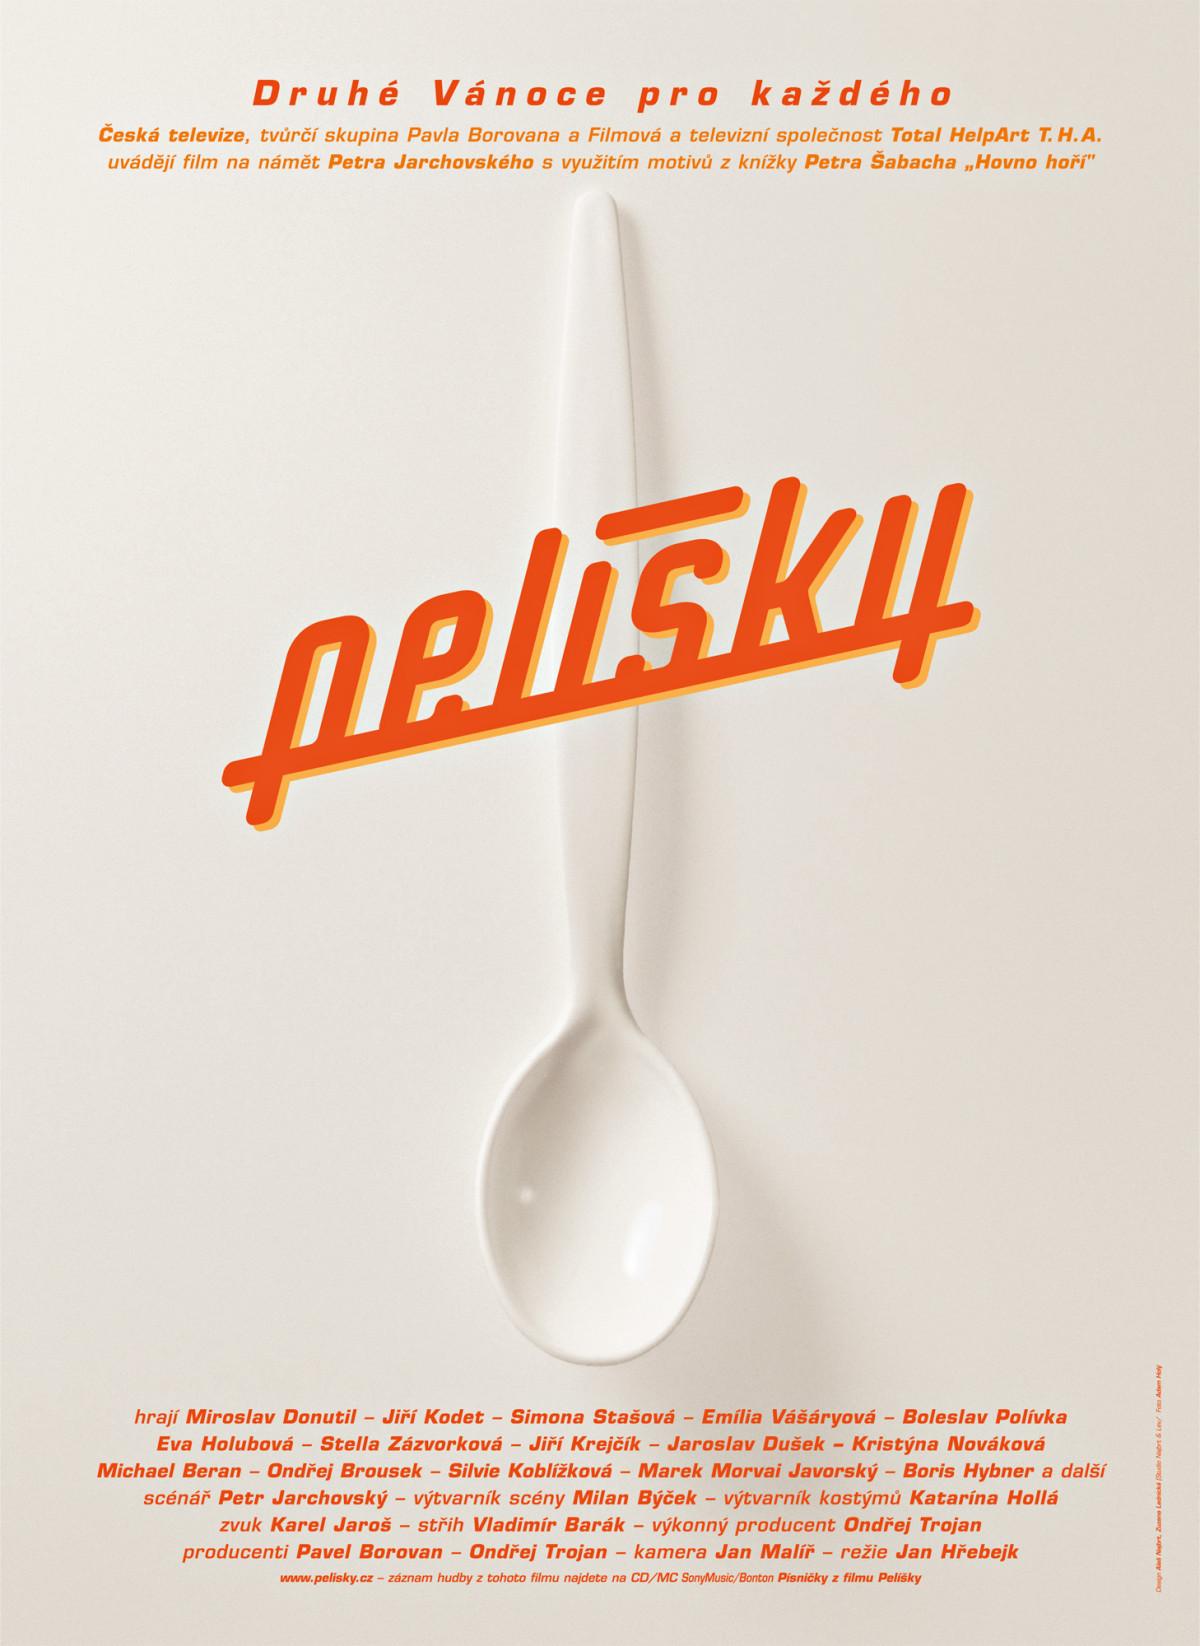 image Pelísky Watch Full Movie Free Online